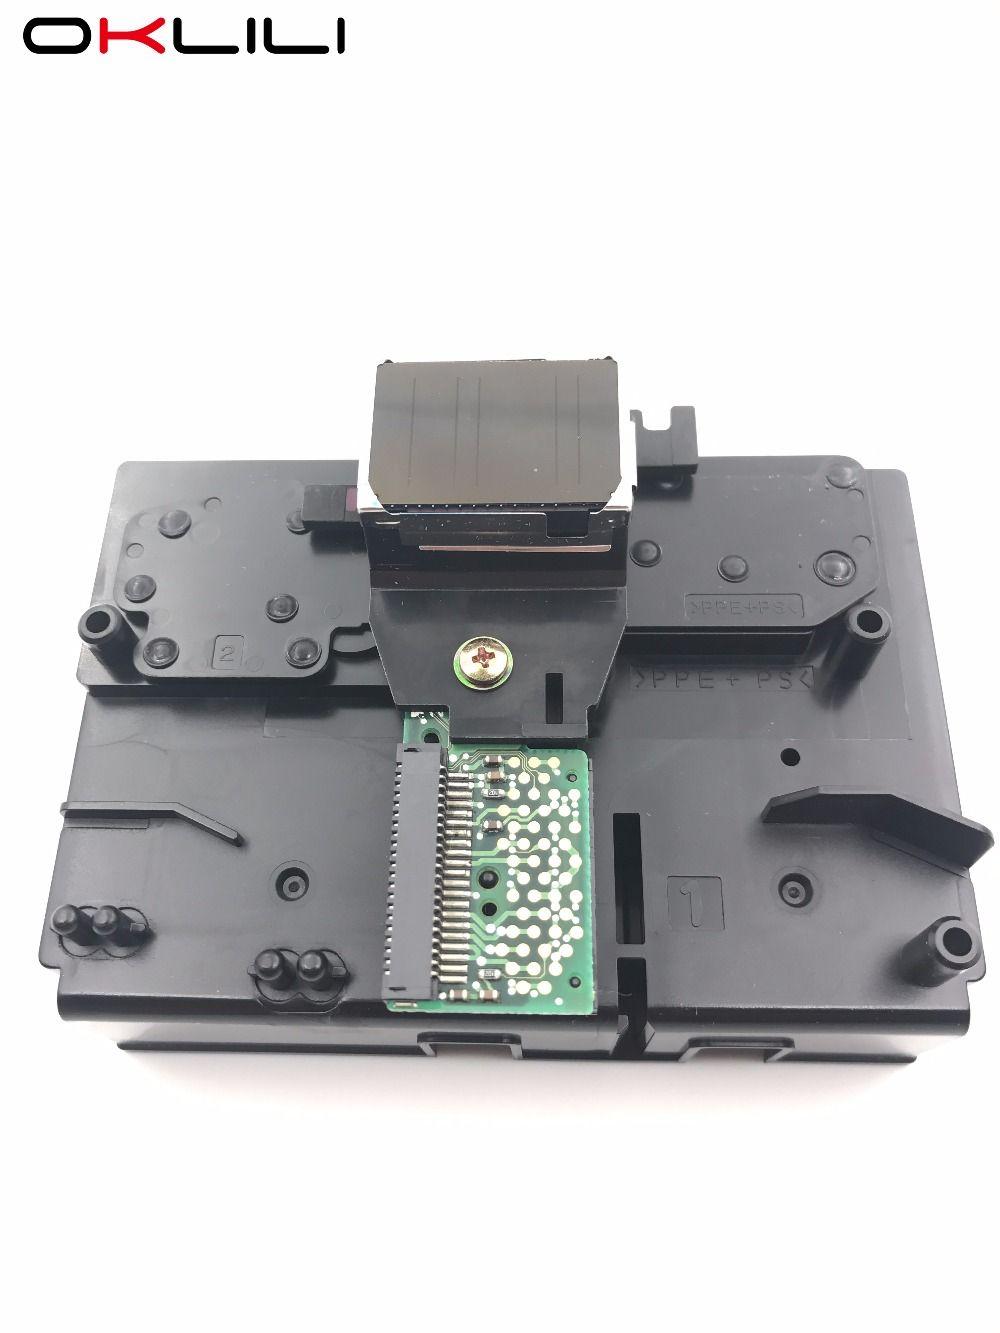 F072000 Printhead Printer Head Print Head for Epson Stylus Color 900 DX3 900G 900N 980 980N for Roland DX3 FJ500 FJ600